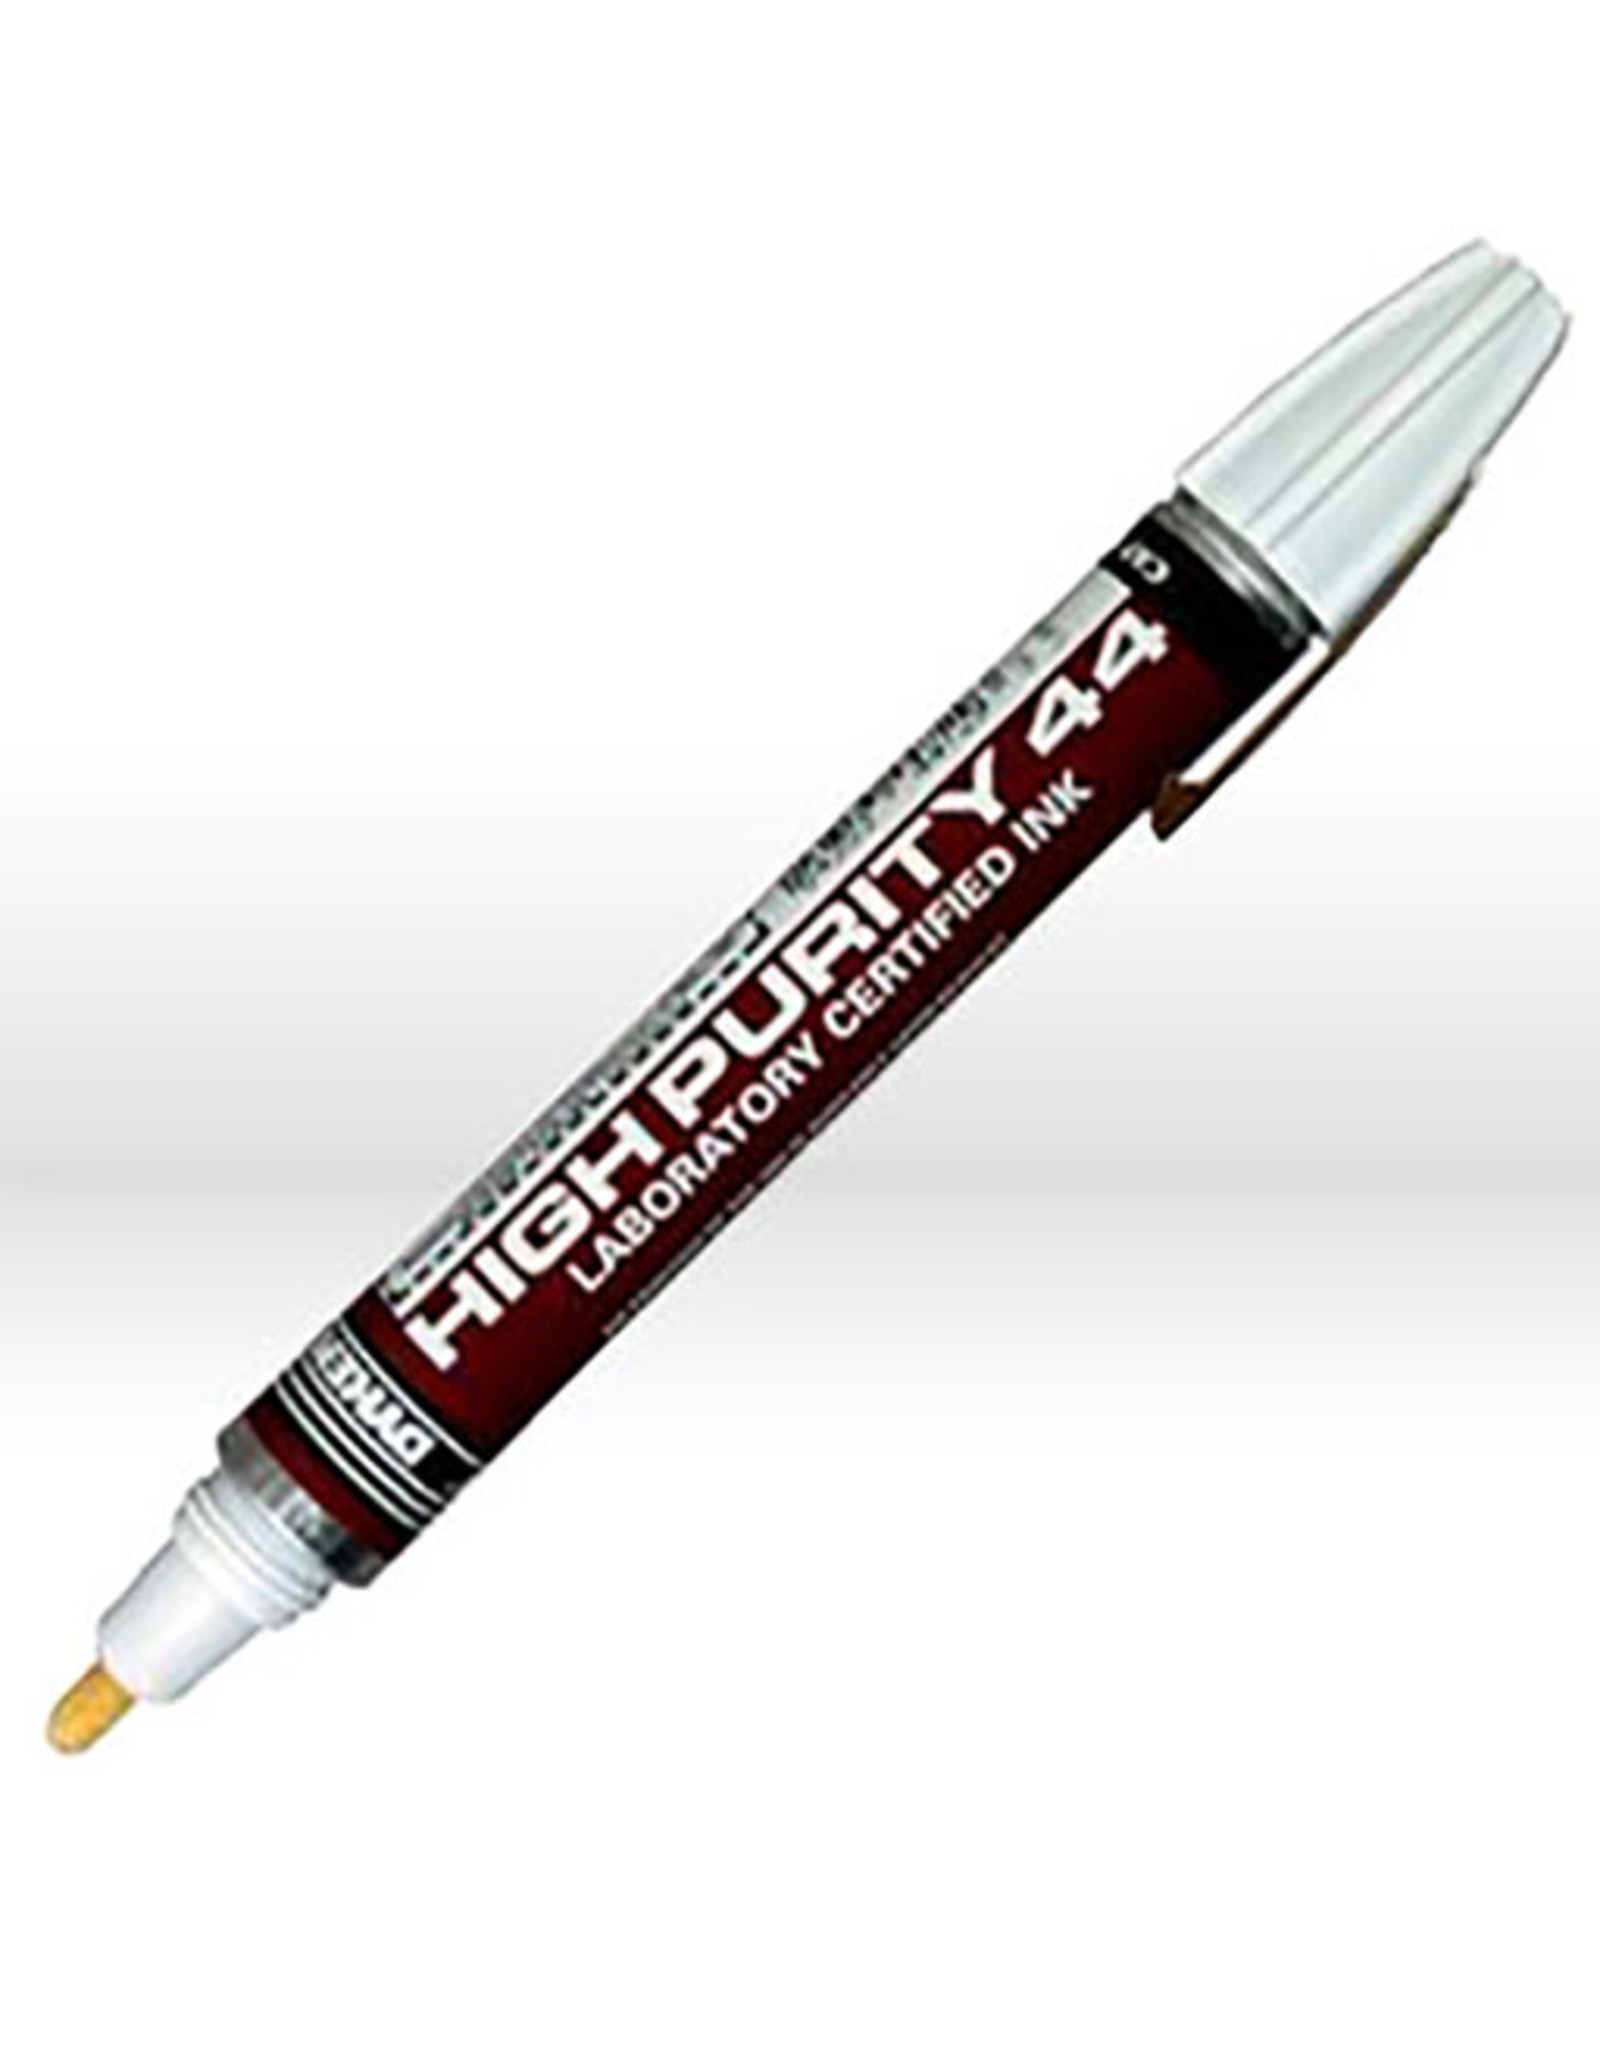 Dykem DYKEM High Purity 44 Marker - White